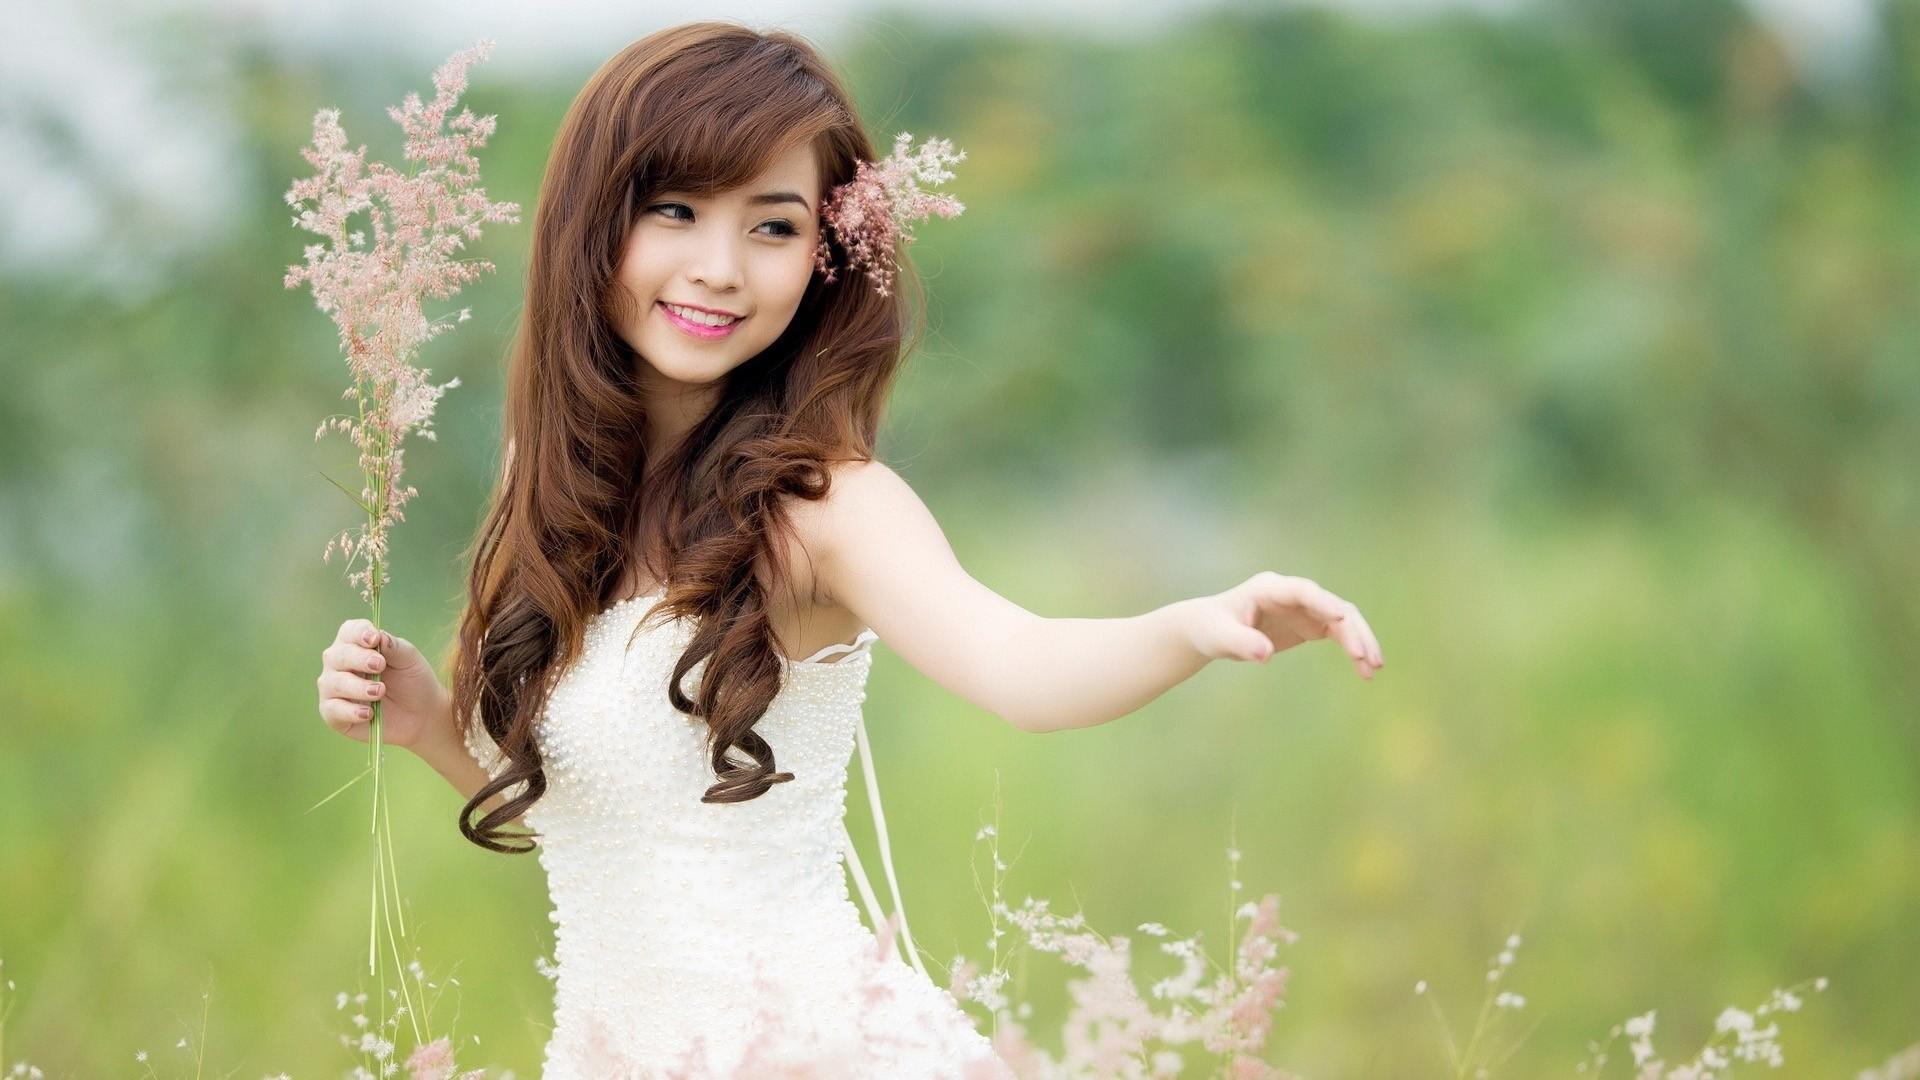 Cute Asian Wallpaper (73+ images)